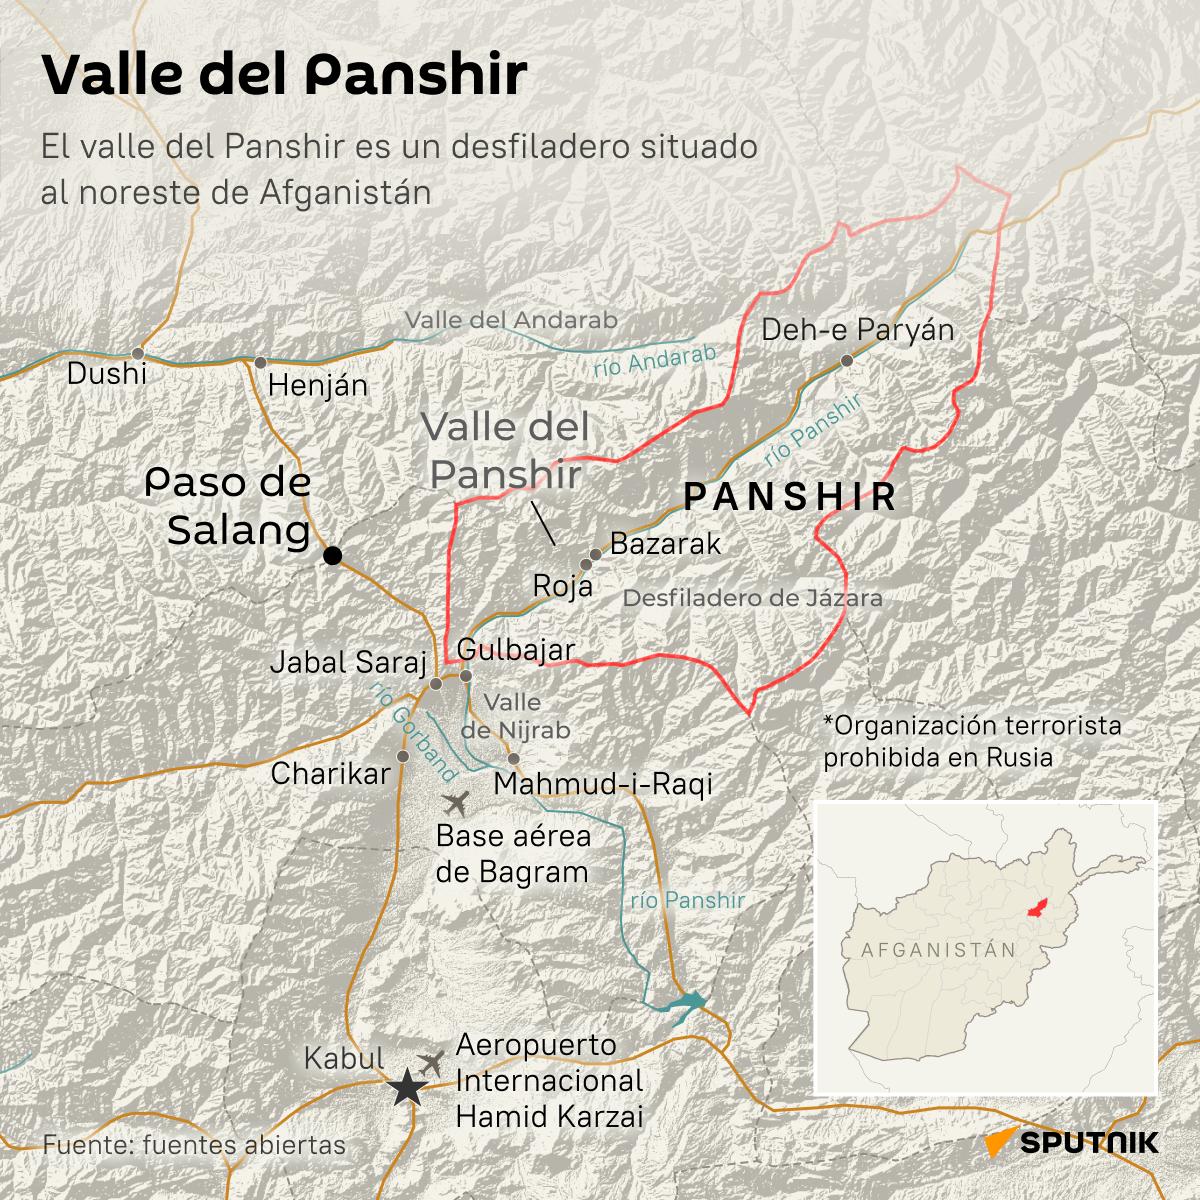 Valle del Panshir - Sputnik Mundo